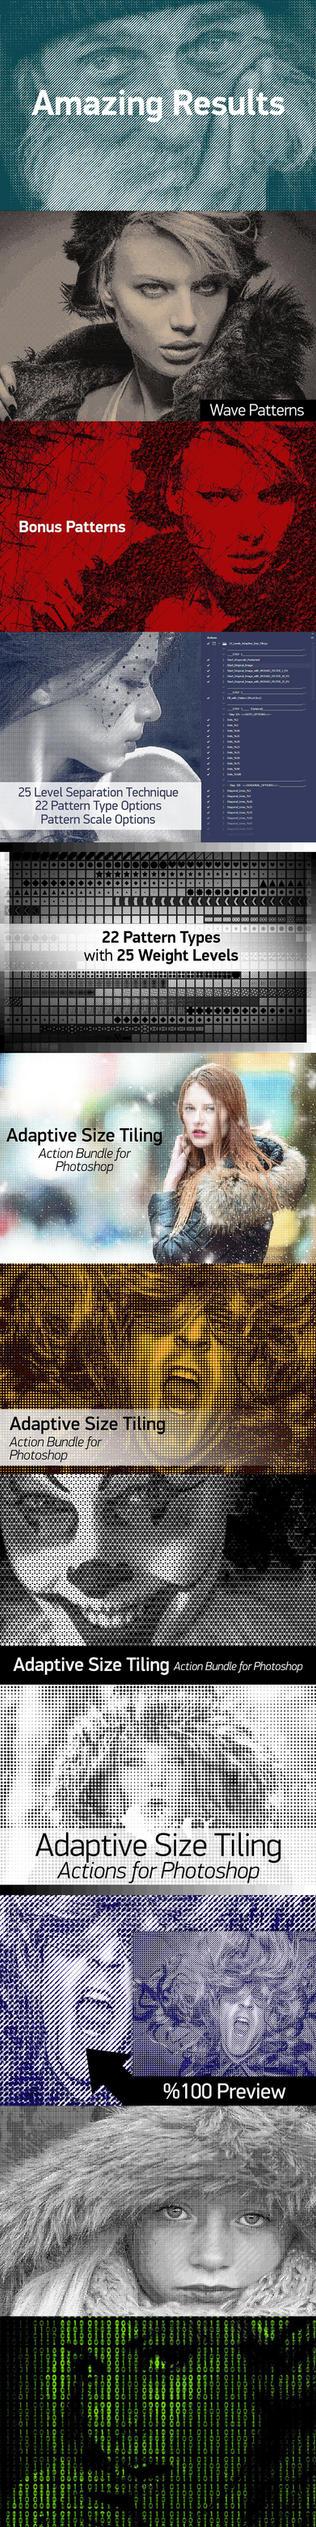 Adaptive Size Tiling - Photoshop Action Bundle by Grasycho